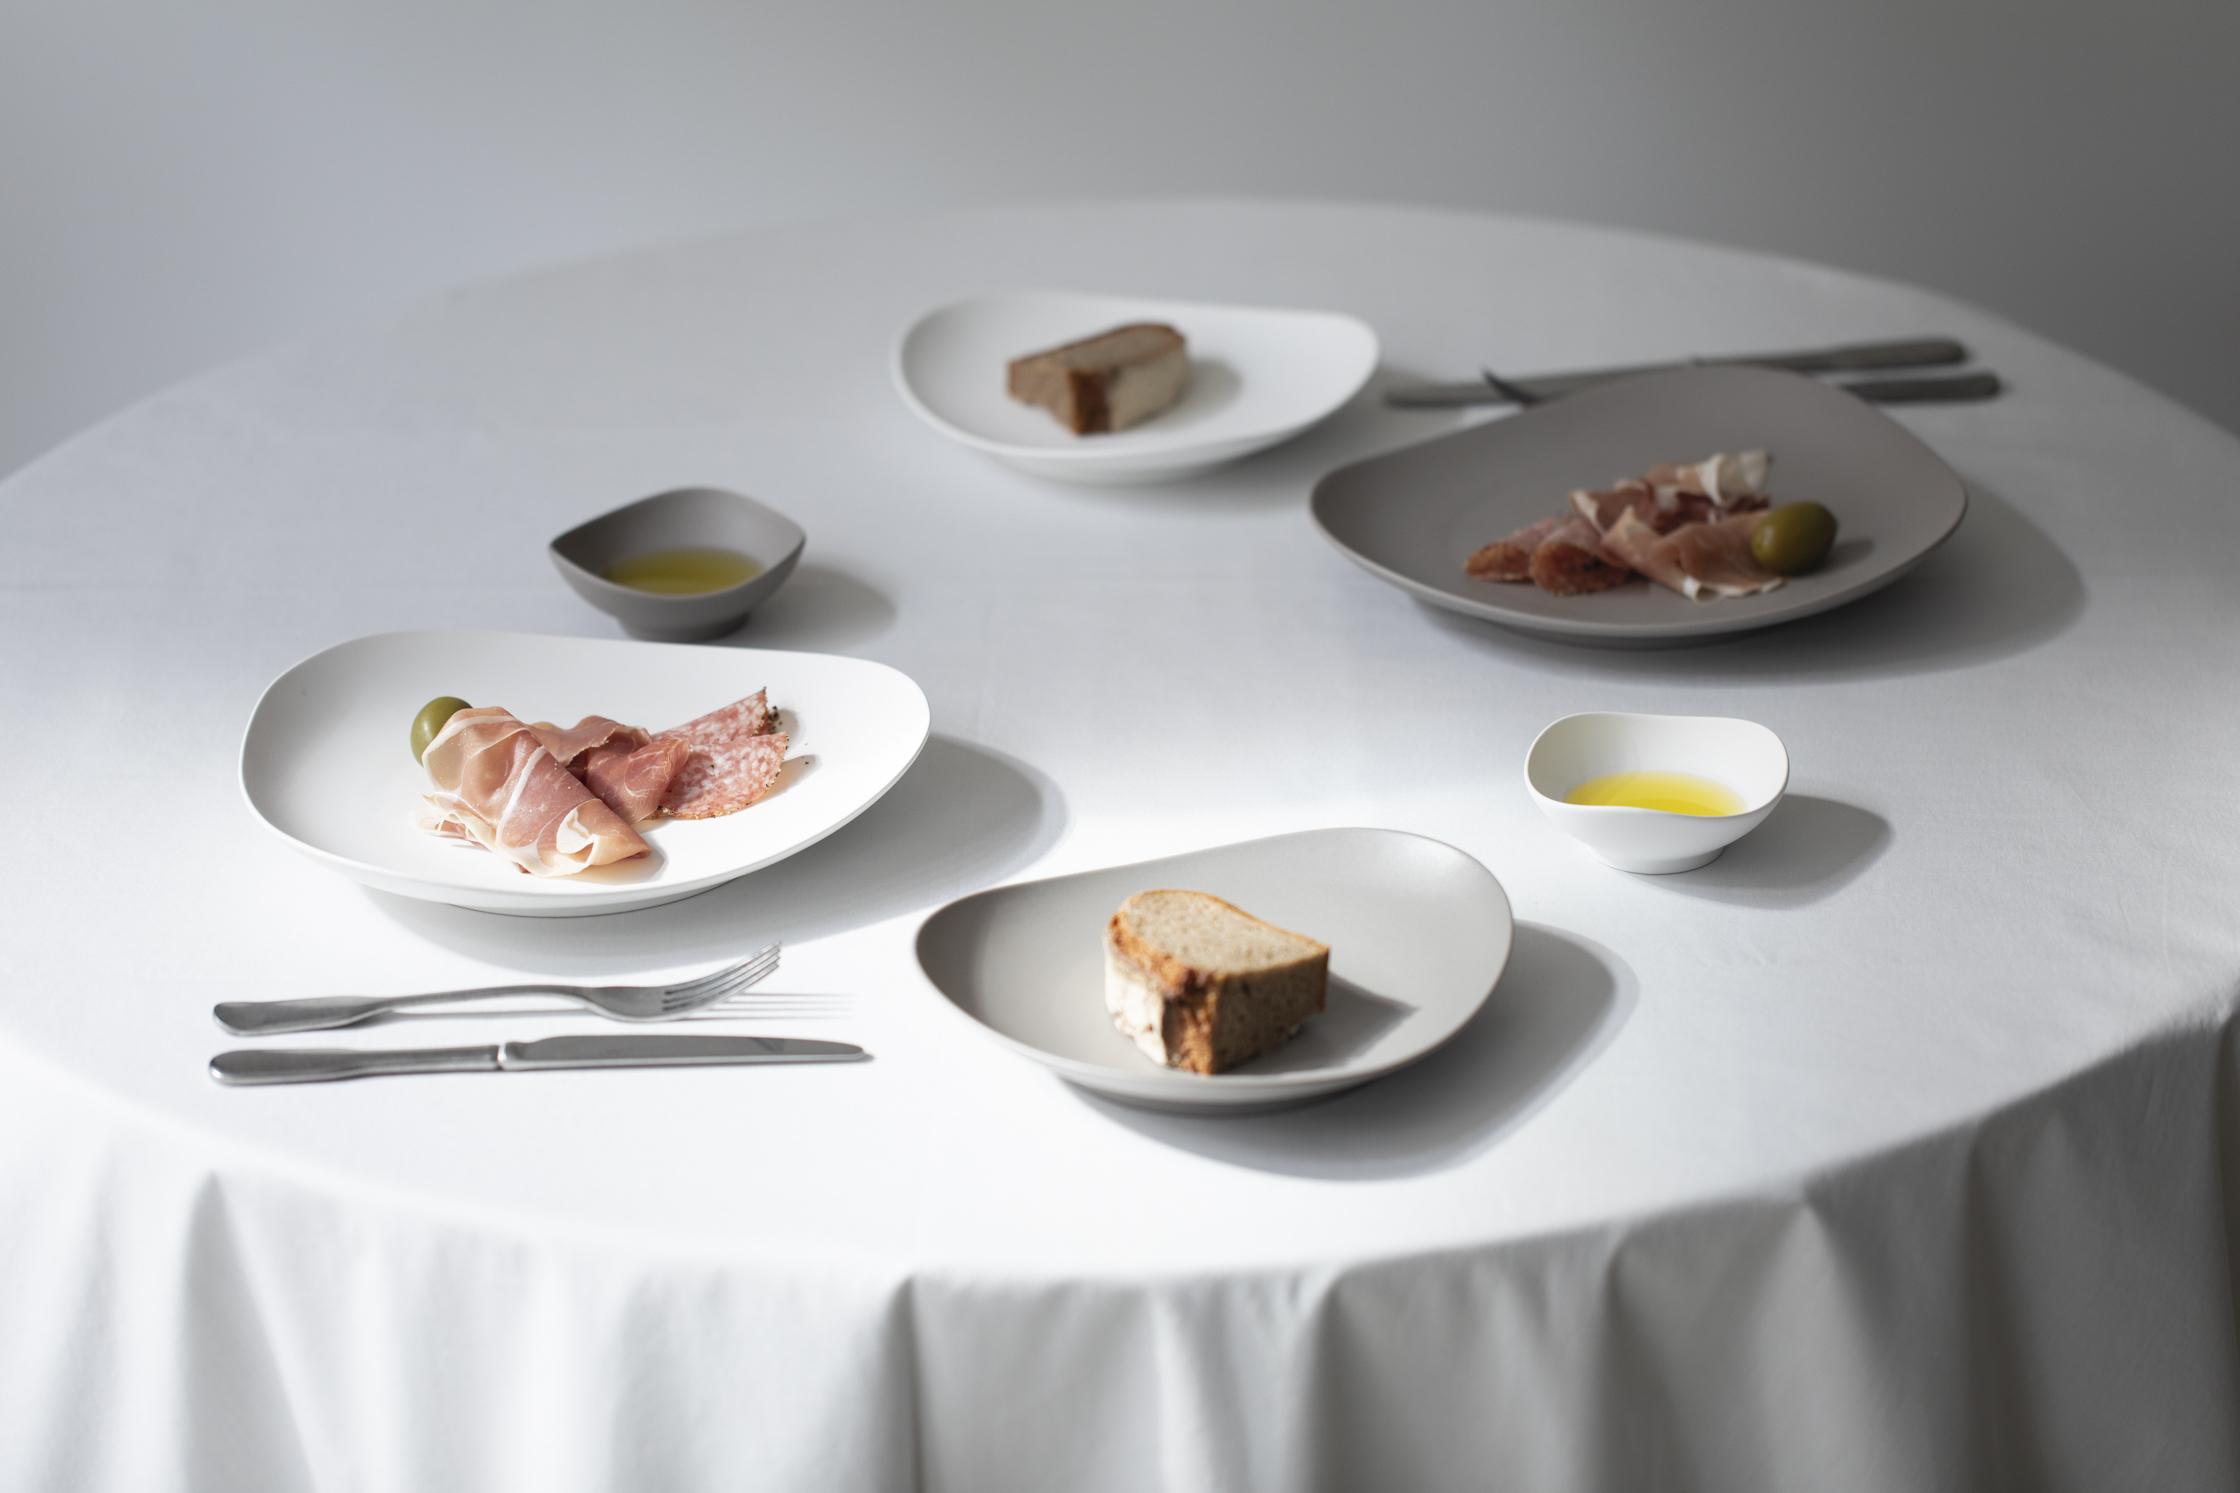 plate 245mm ¥3,300、plate 195mm ¥2,420、almond dish ¥990 (税込)